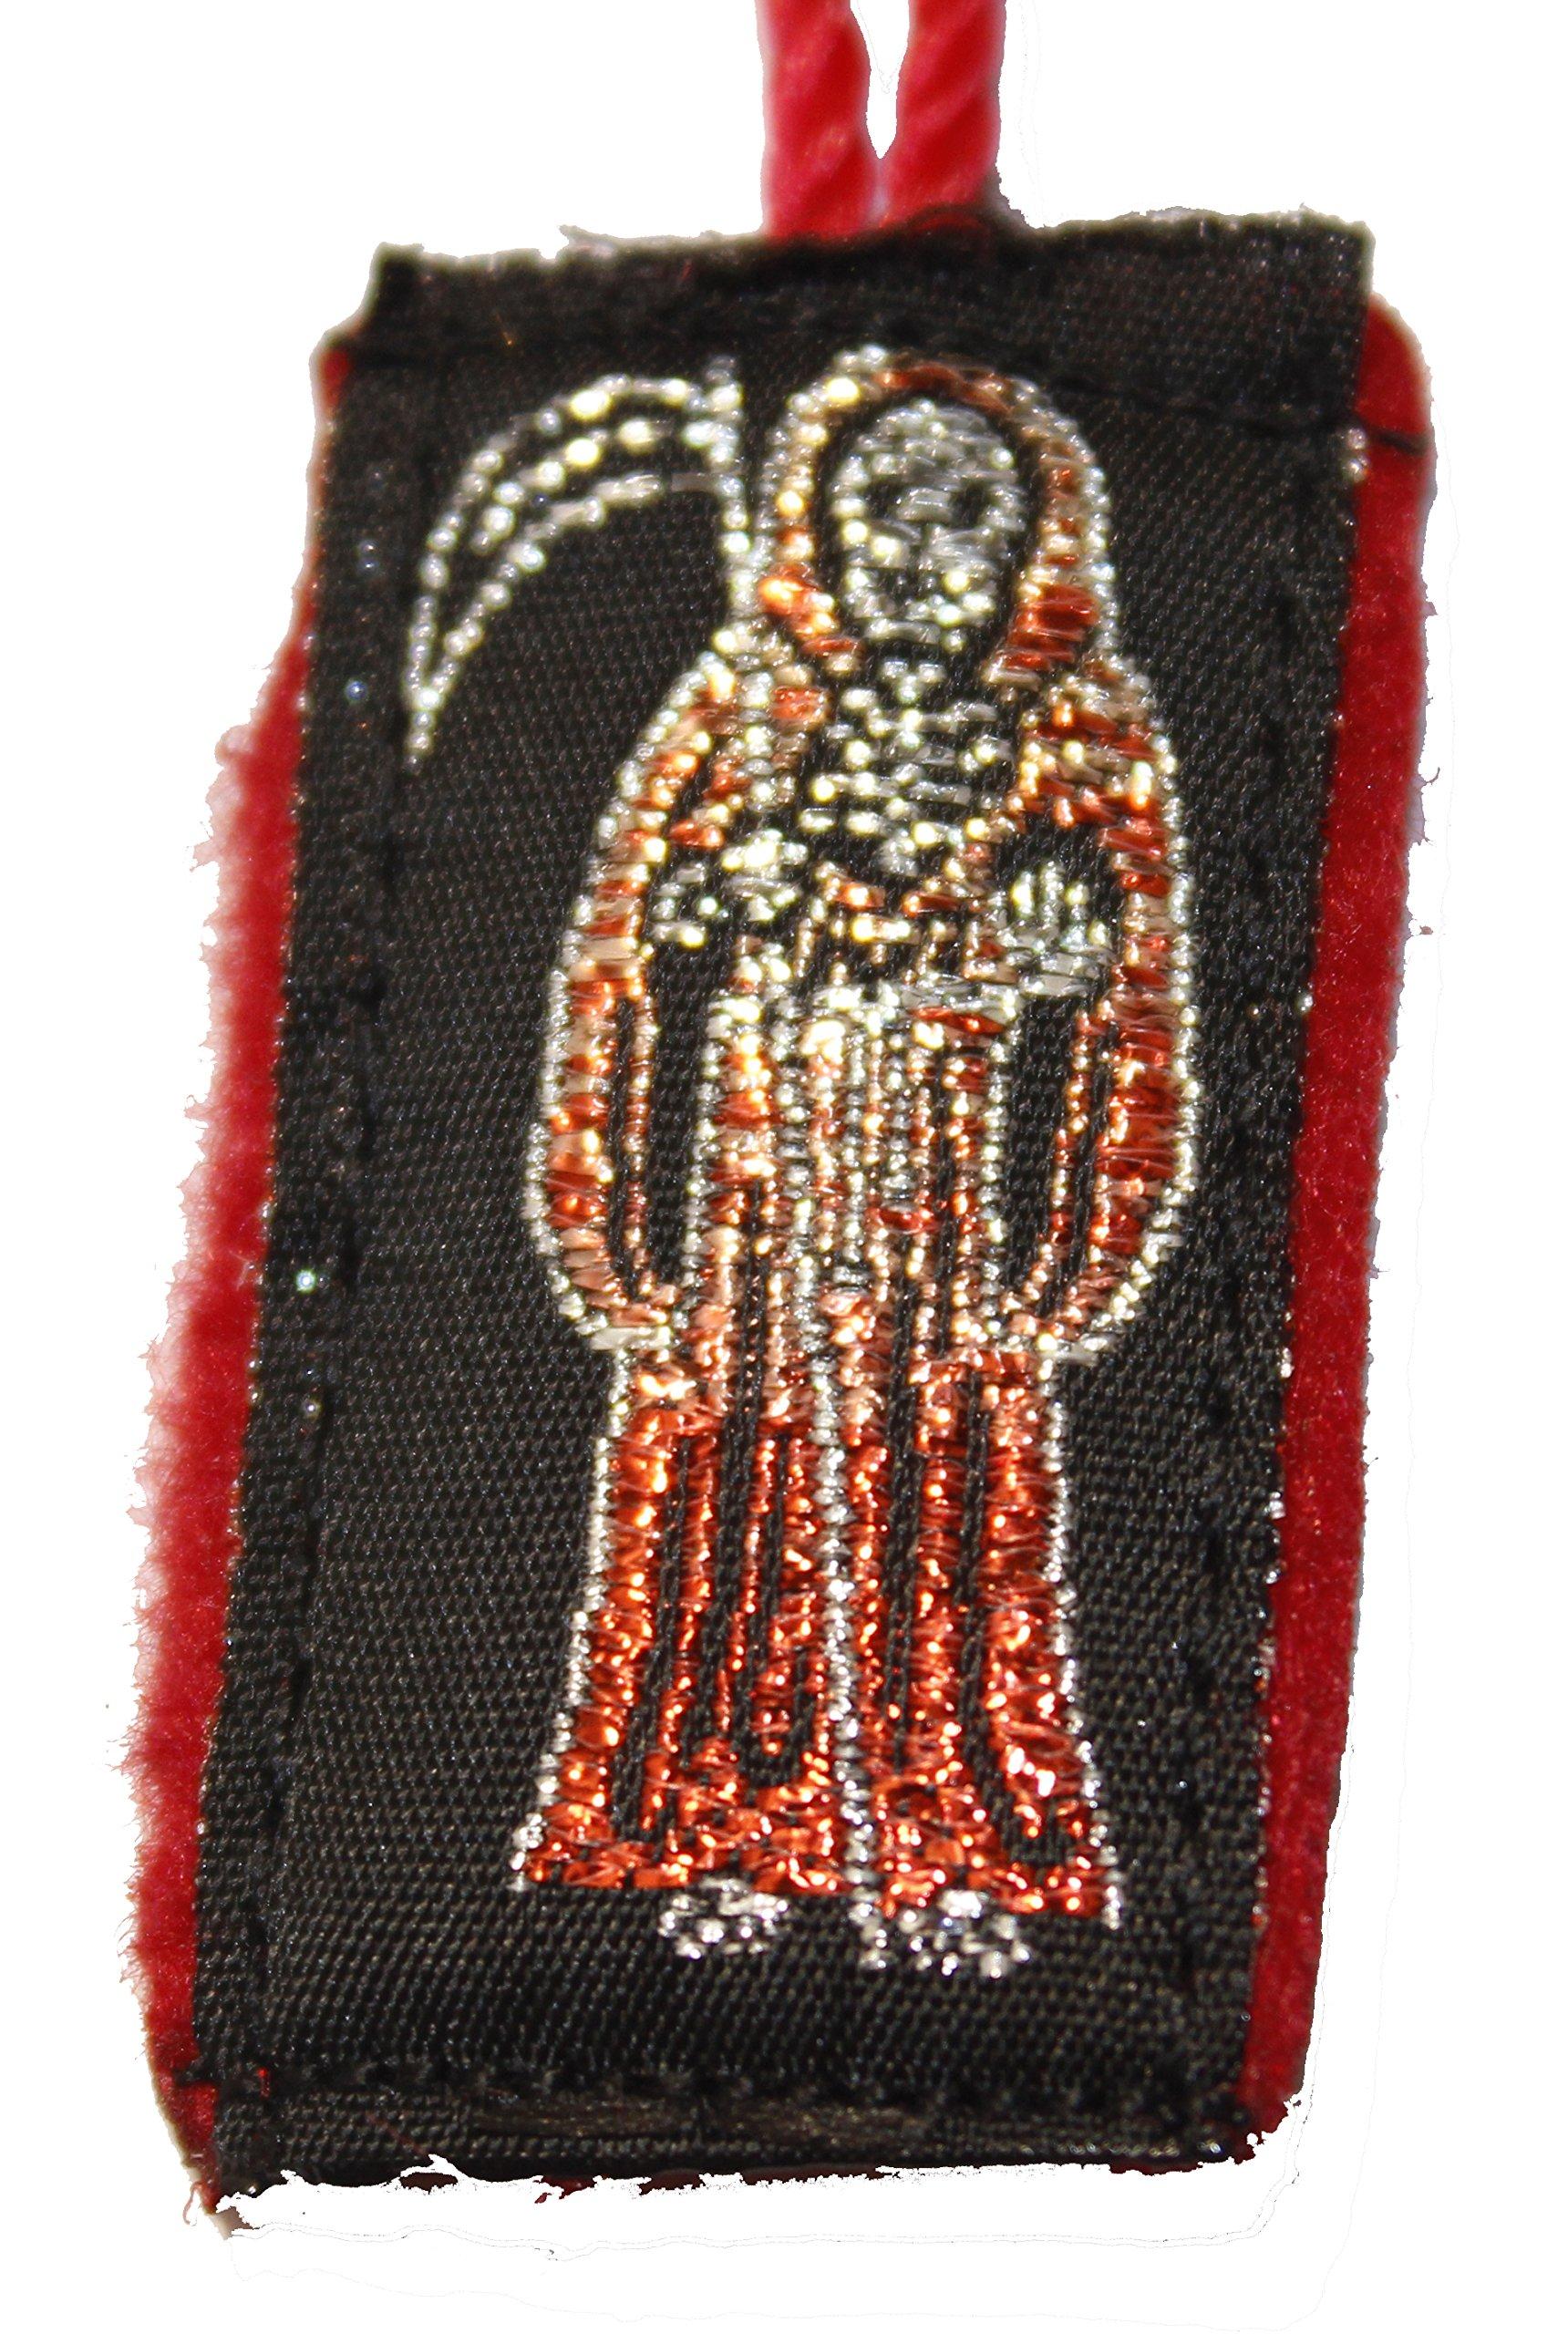 Holy Death Red Santa Muerte Escapulario de Hilo-Knotted Mexico Scapulary